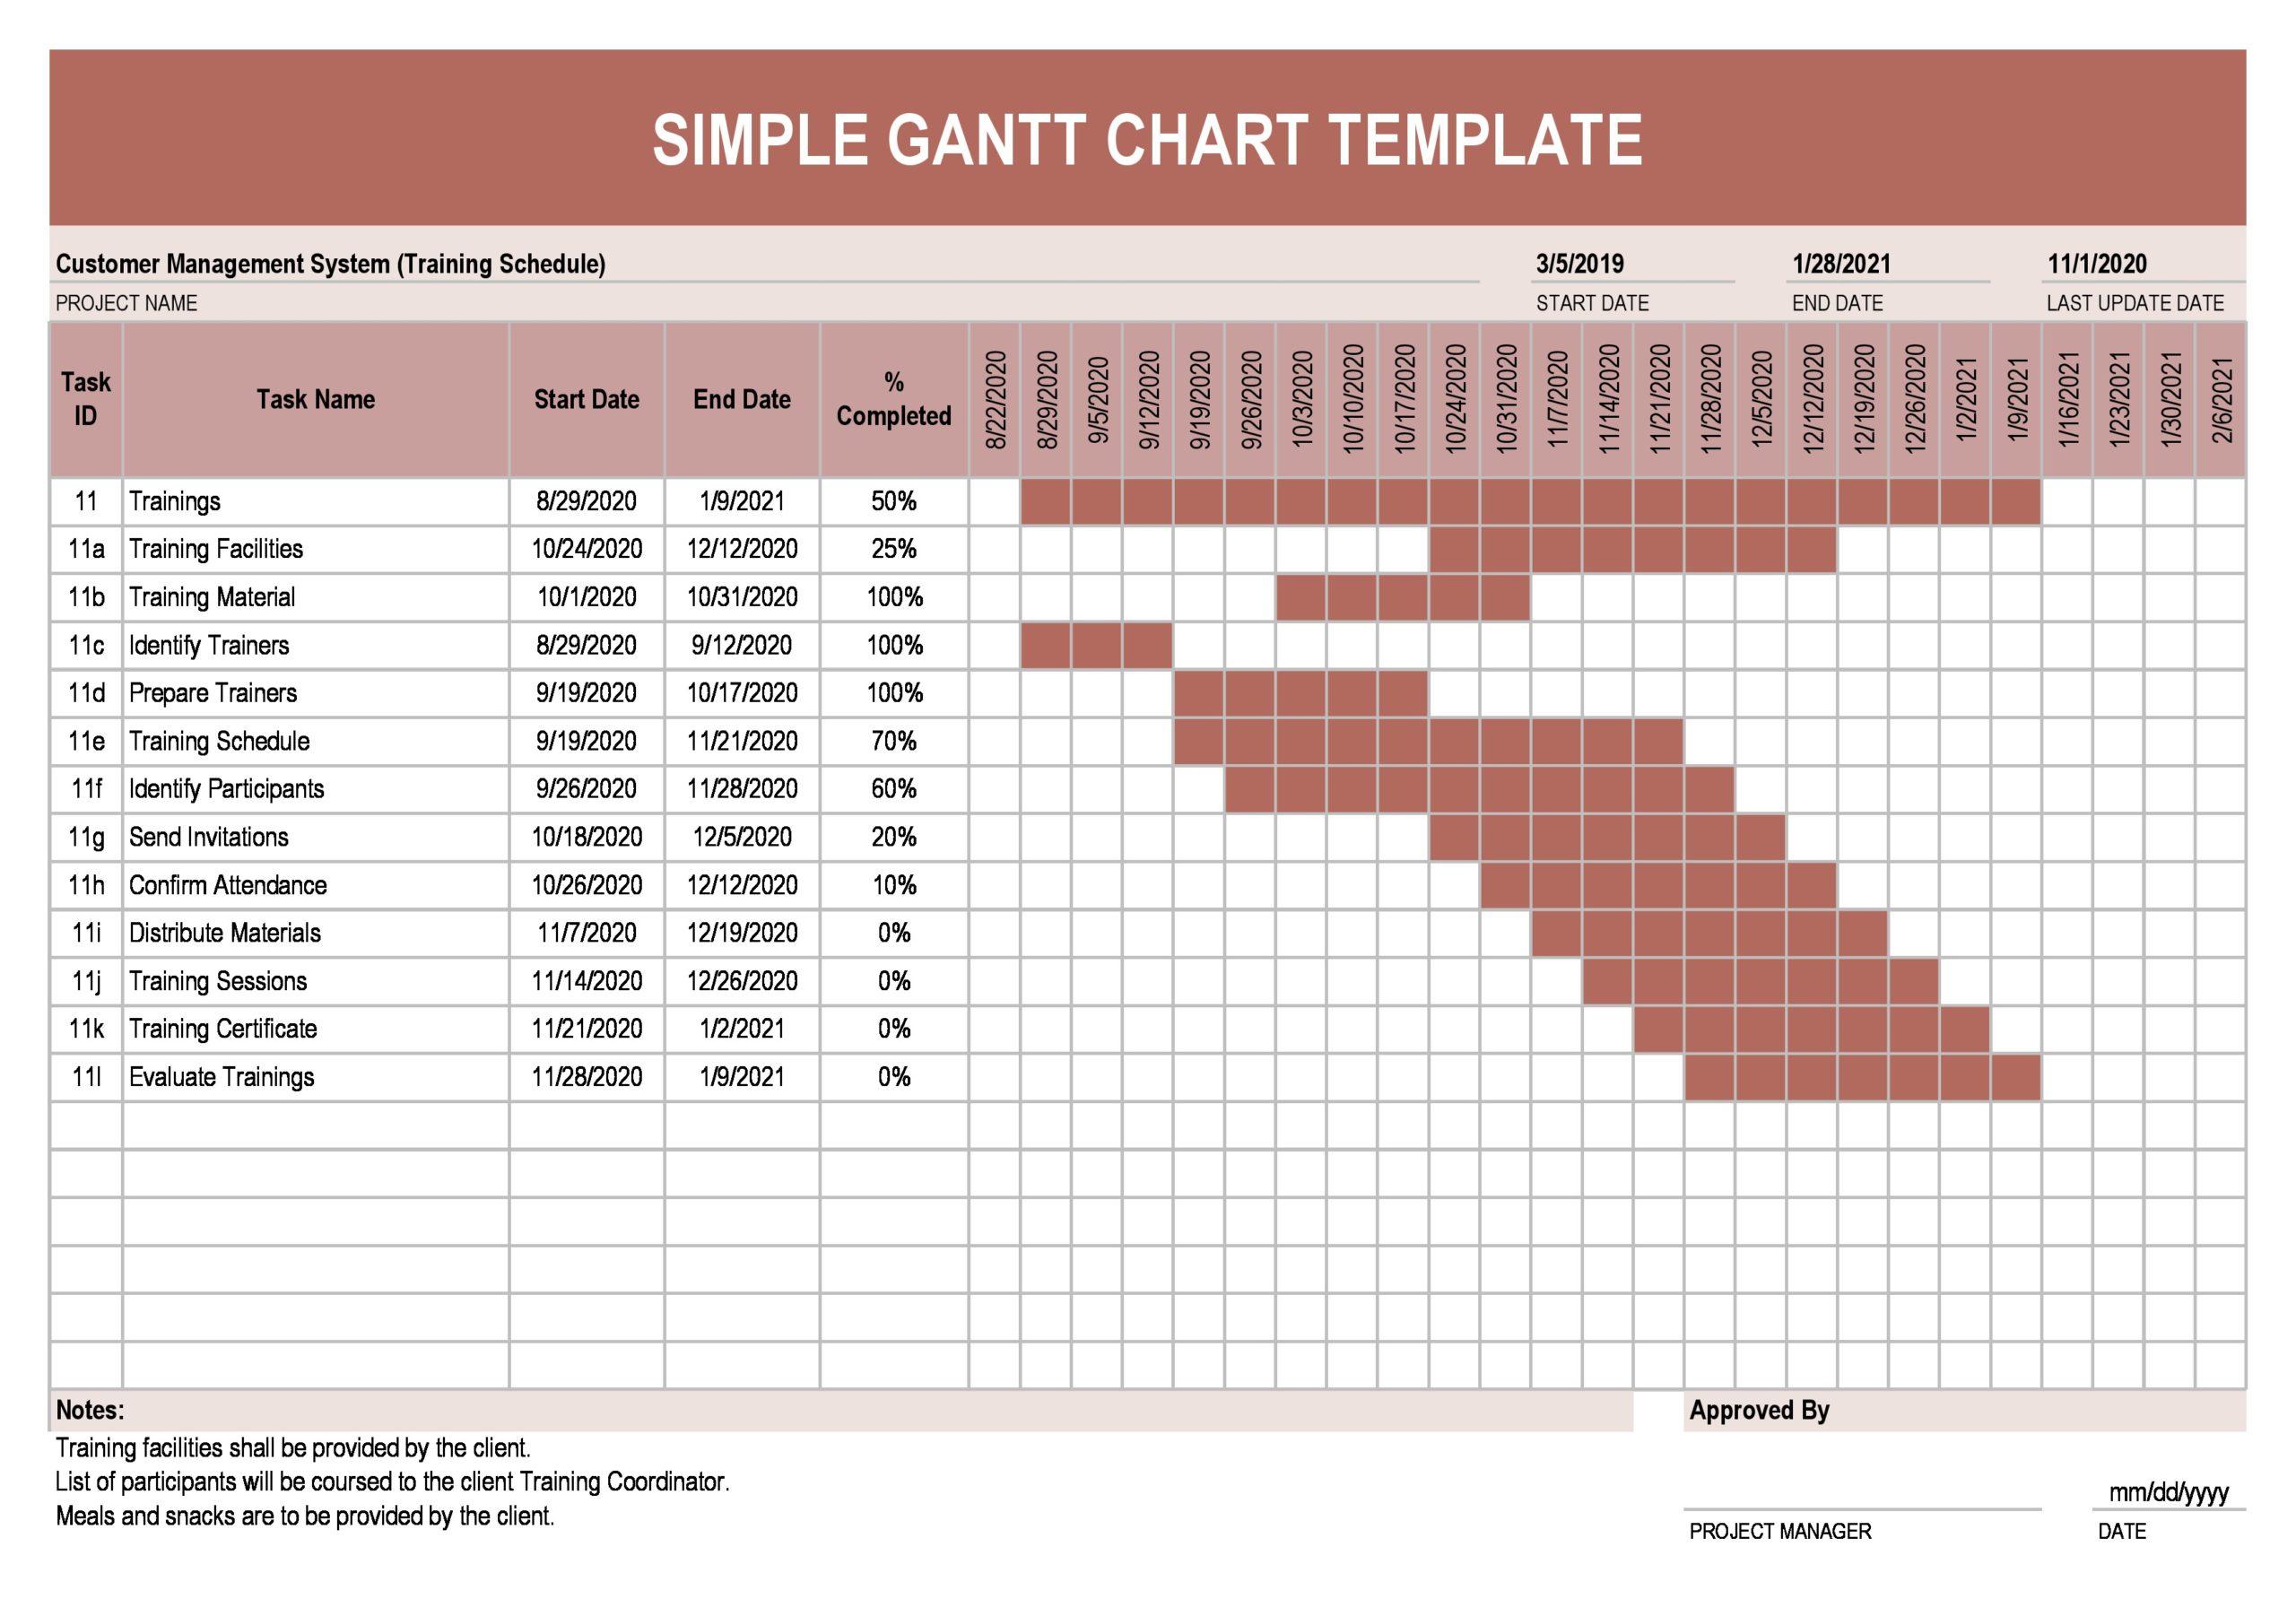 41 Free Gantt Chart Templates (Excel Powerpoint Word) ᐅ